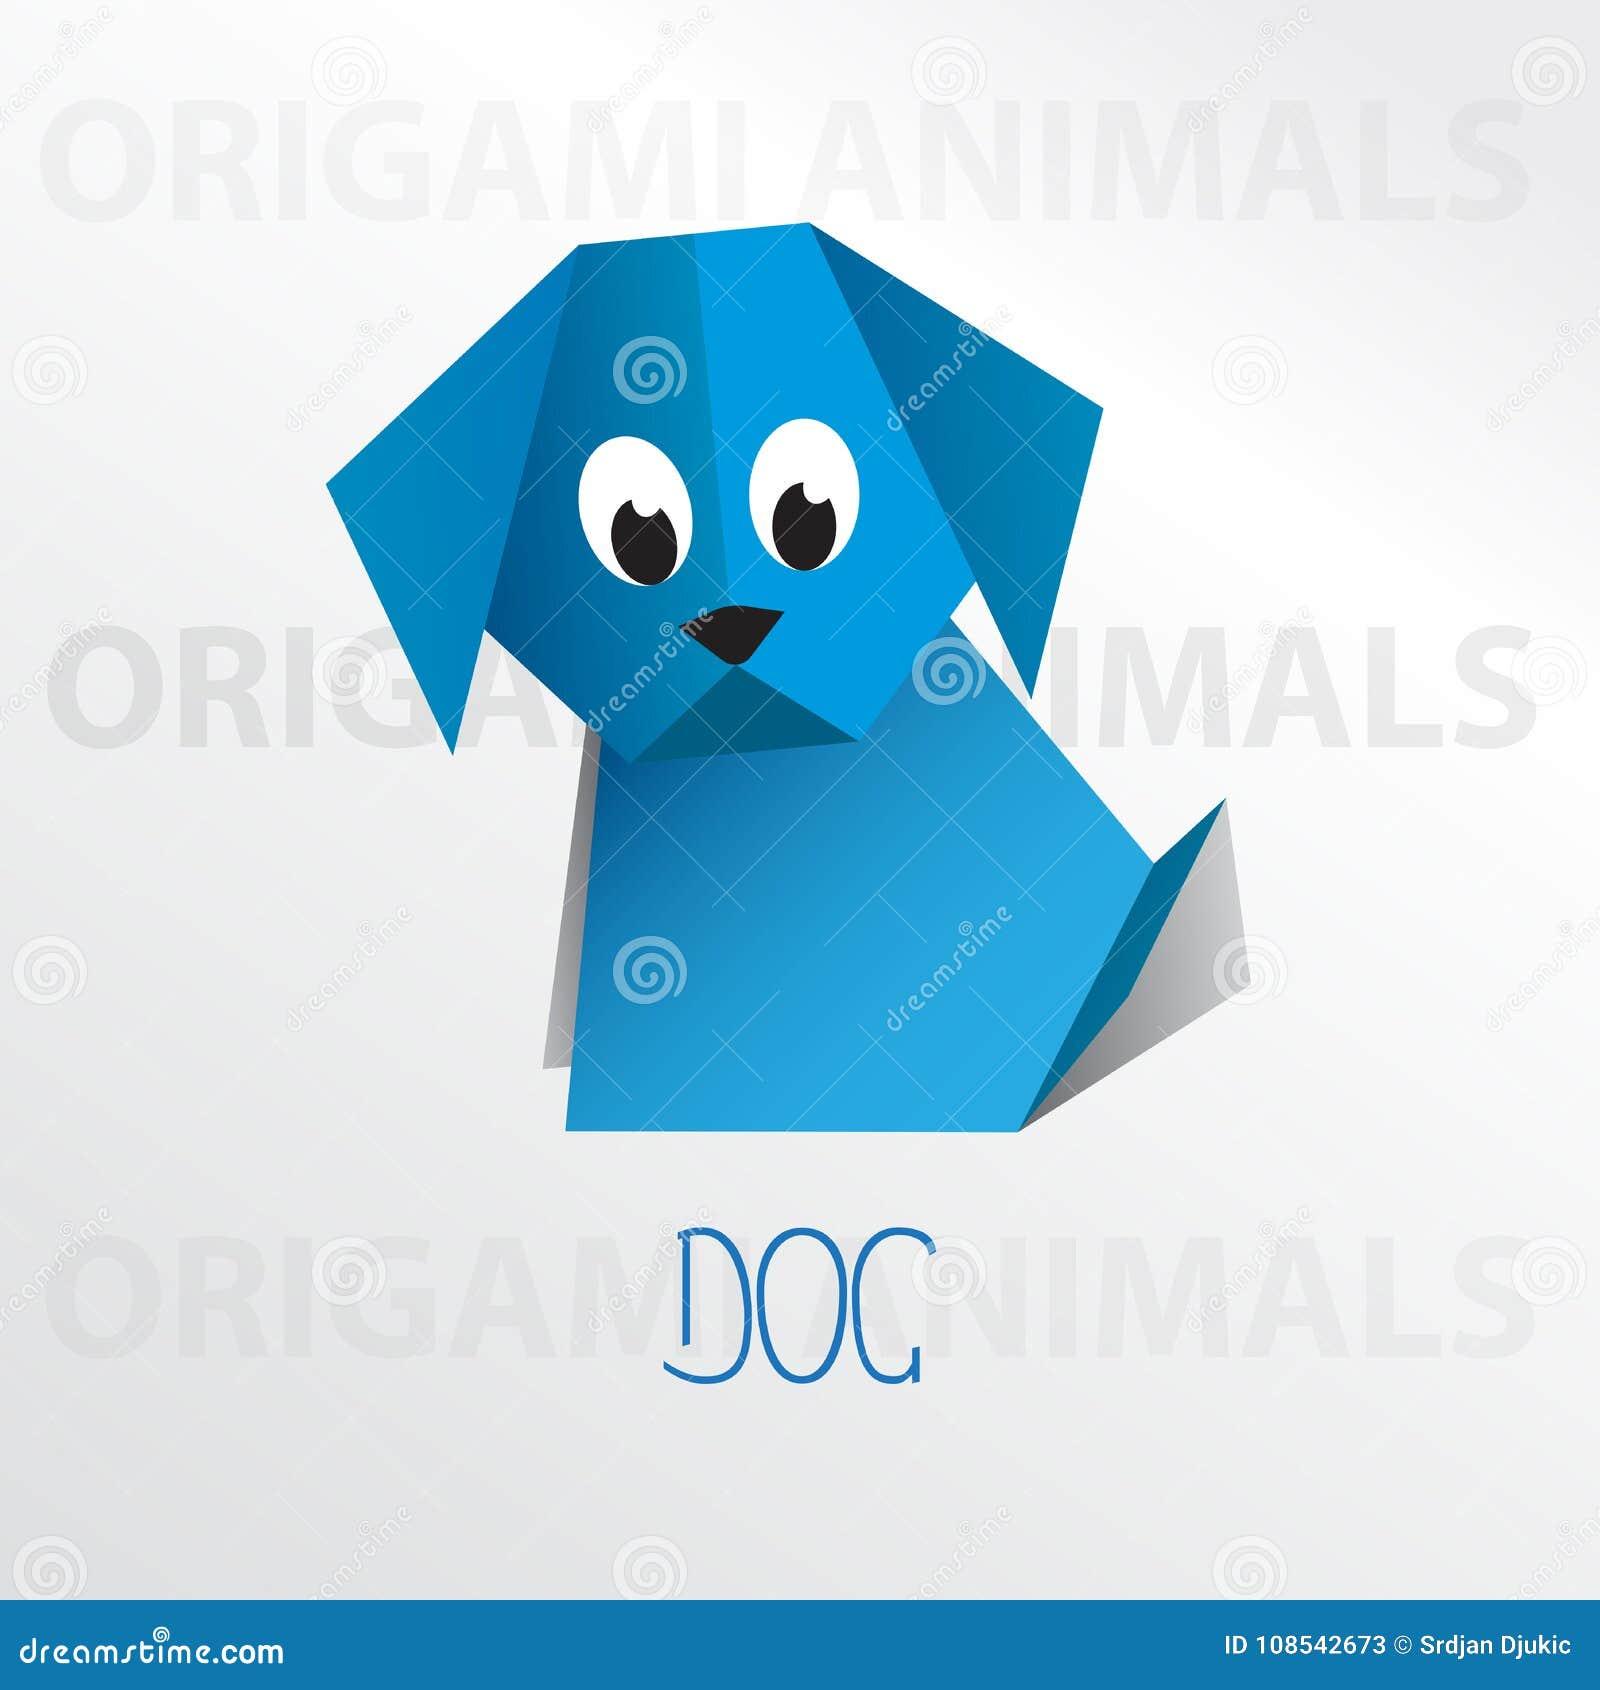 Dog origami paper art illustration